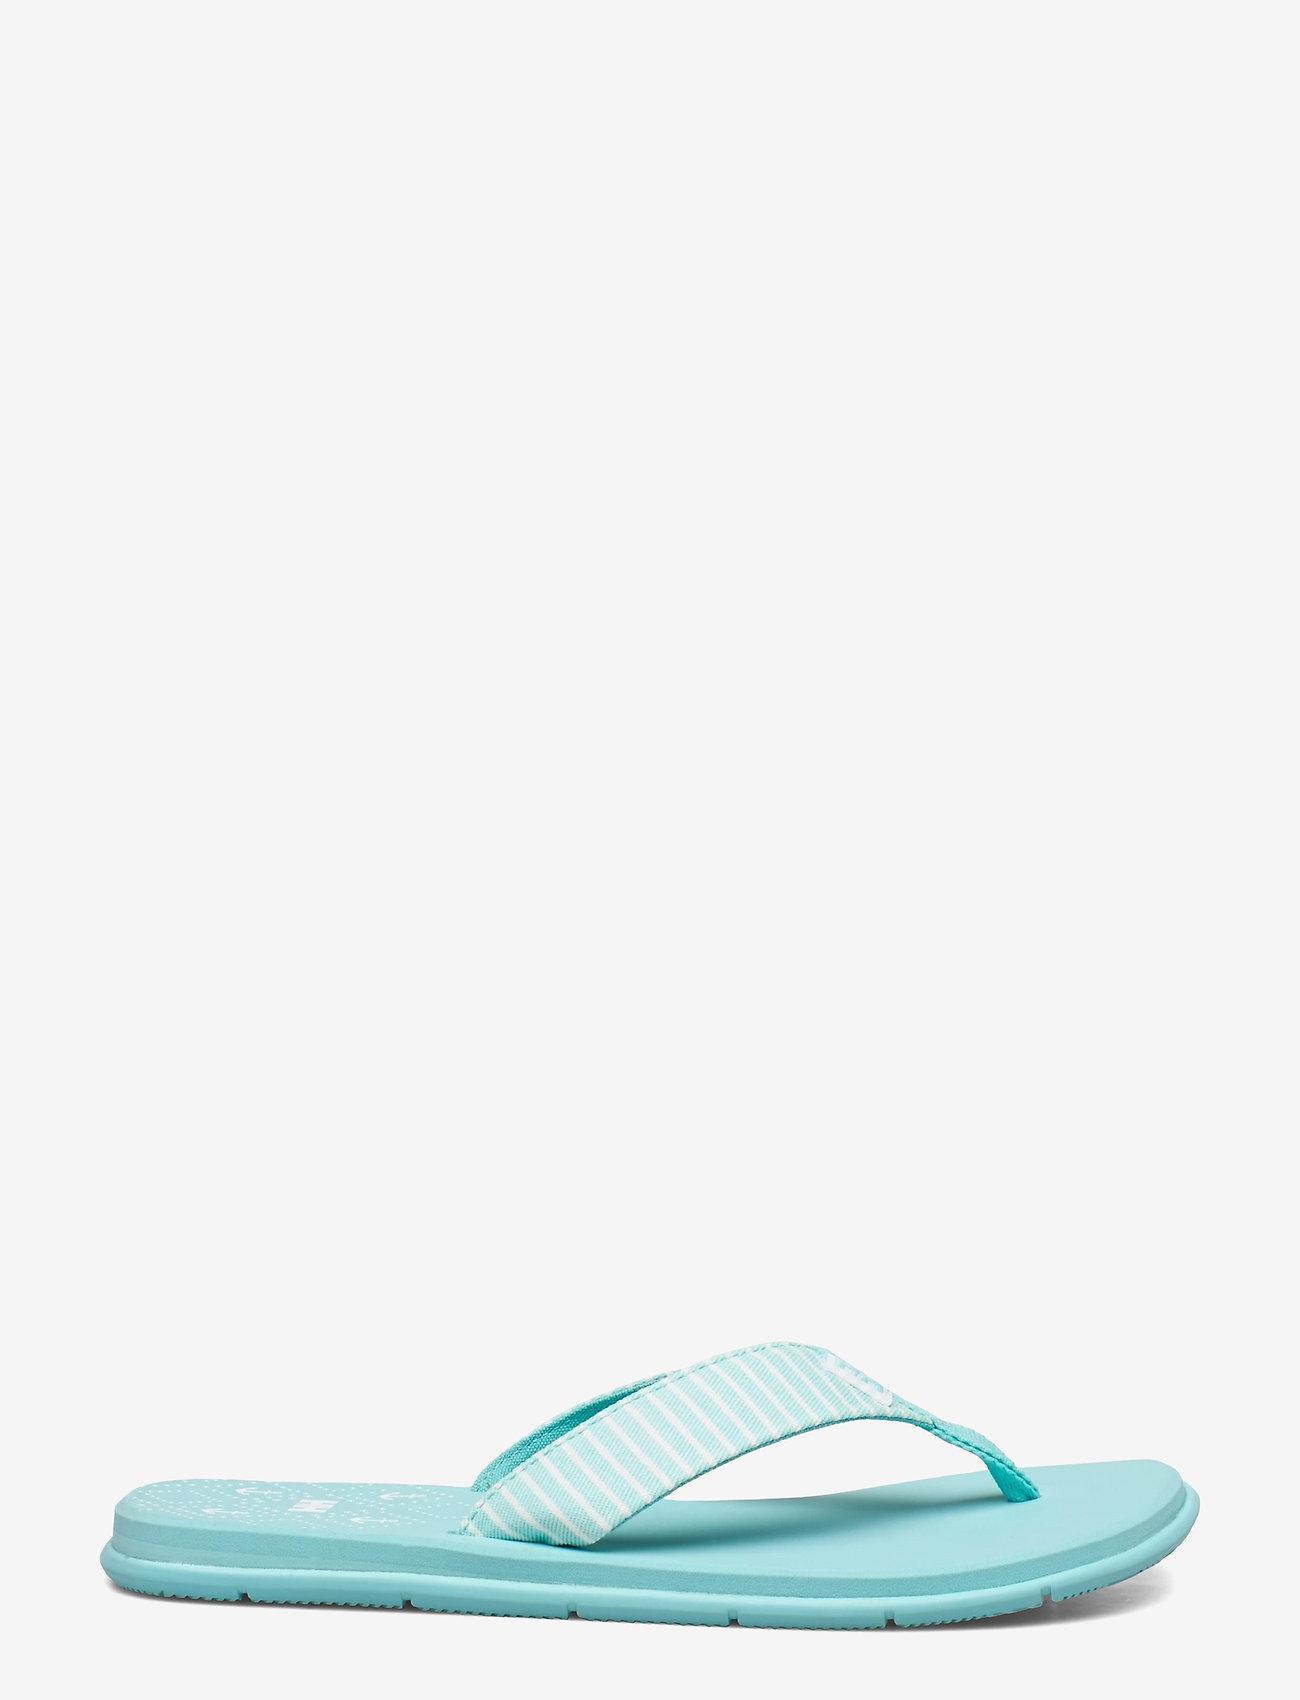 Helly Hansen - W IRIS SANDAL - sport schoenen - glacier blue / off white - 1